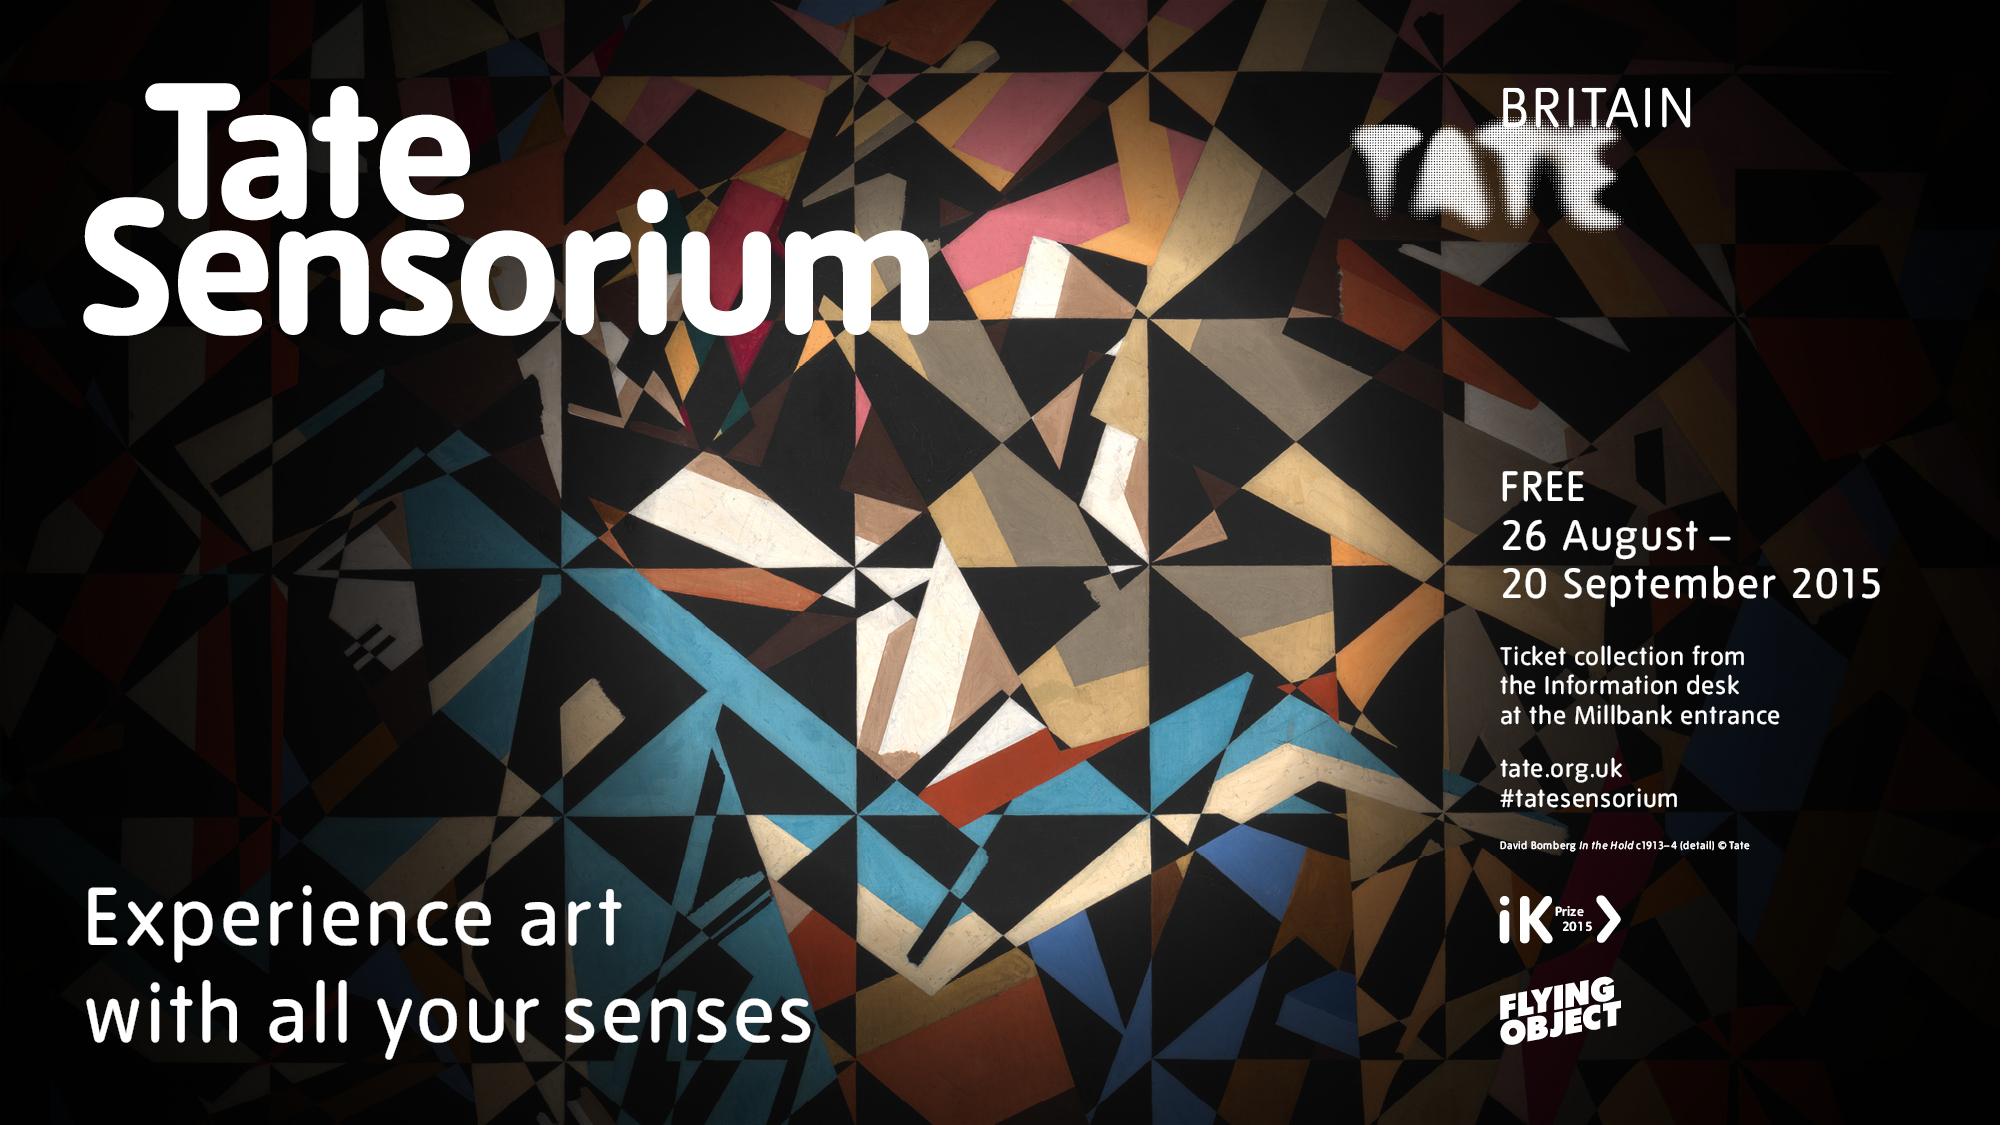 1 DIG 0019 Tate Sensorium web banner 960x540 v1 (2).jpg